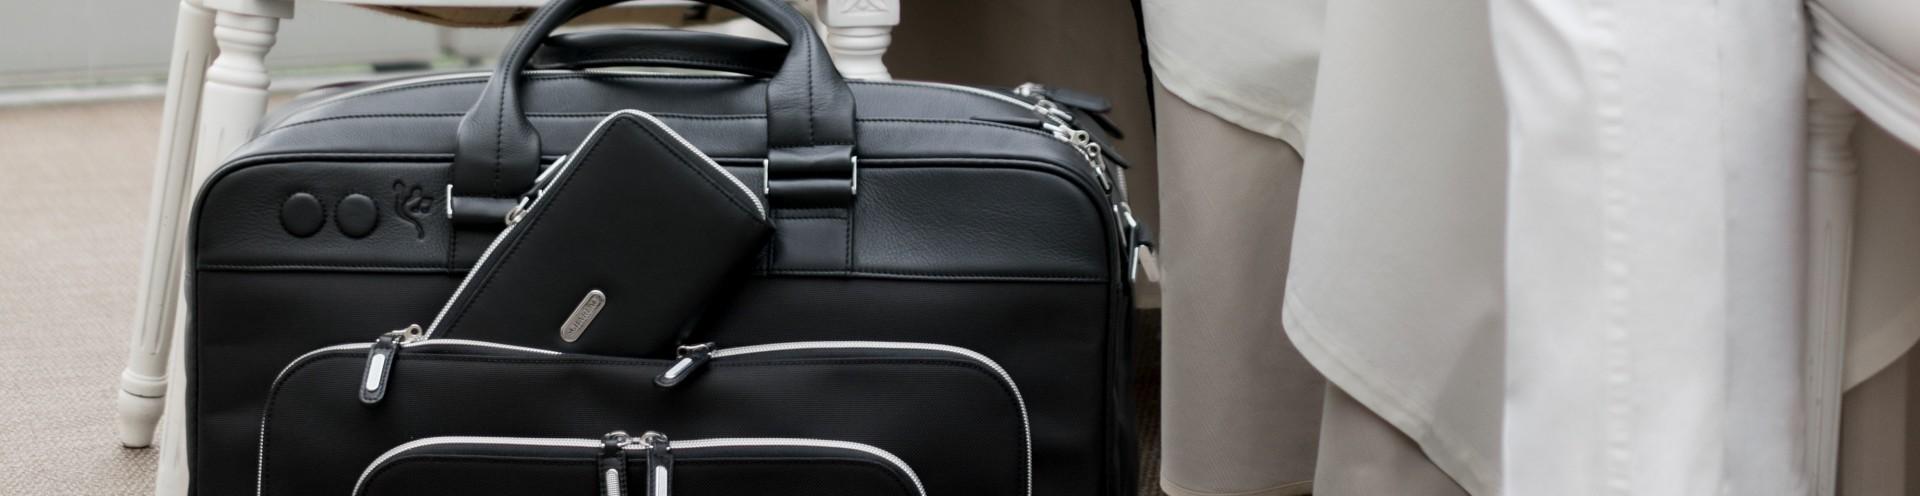 Padlocks for Travel Bags and Backpacks